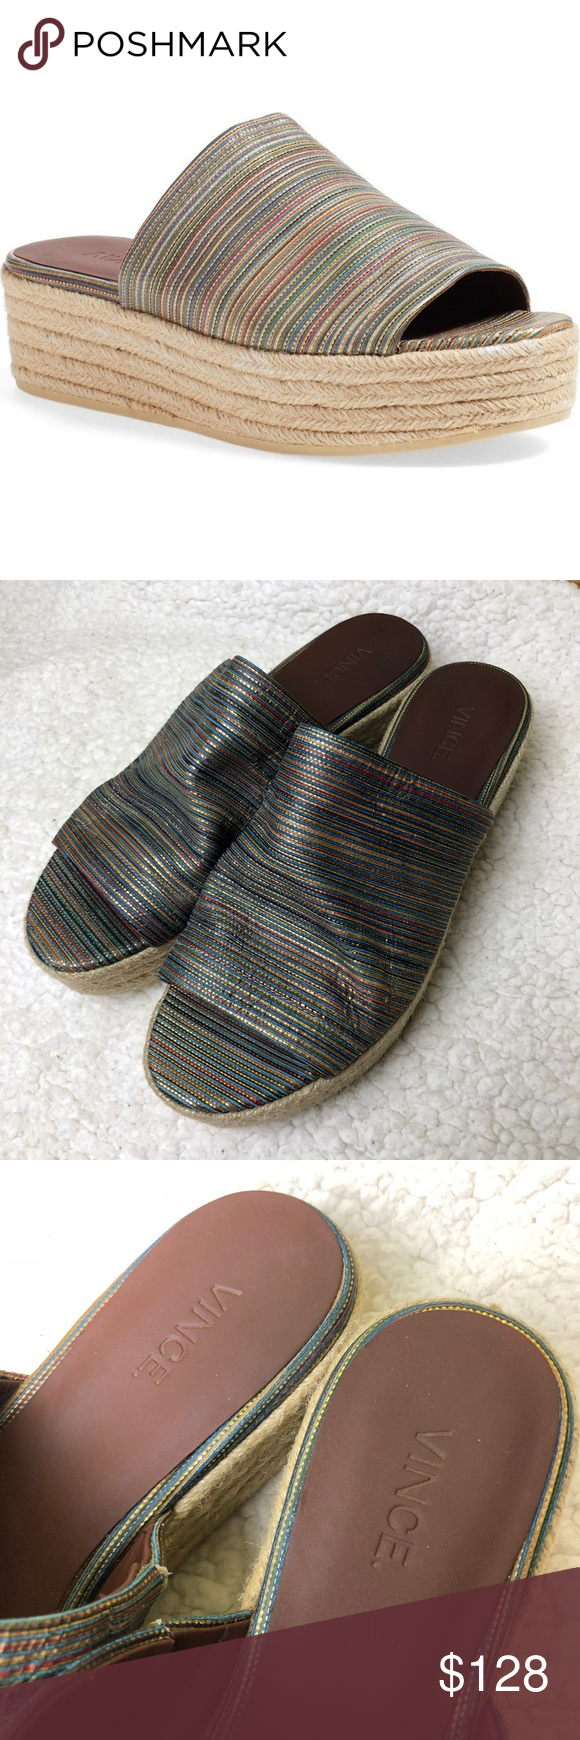 62606bc4ea4a Vince Solana Espadrille Platform Slides Sandals In amazing and clean  condition Vince Shoes Sandals